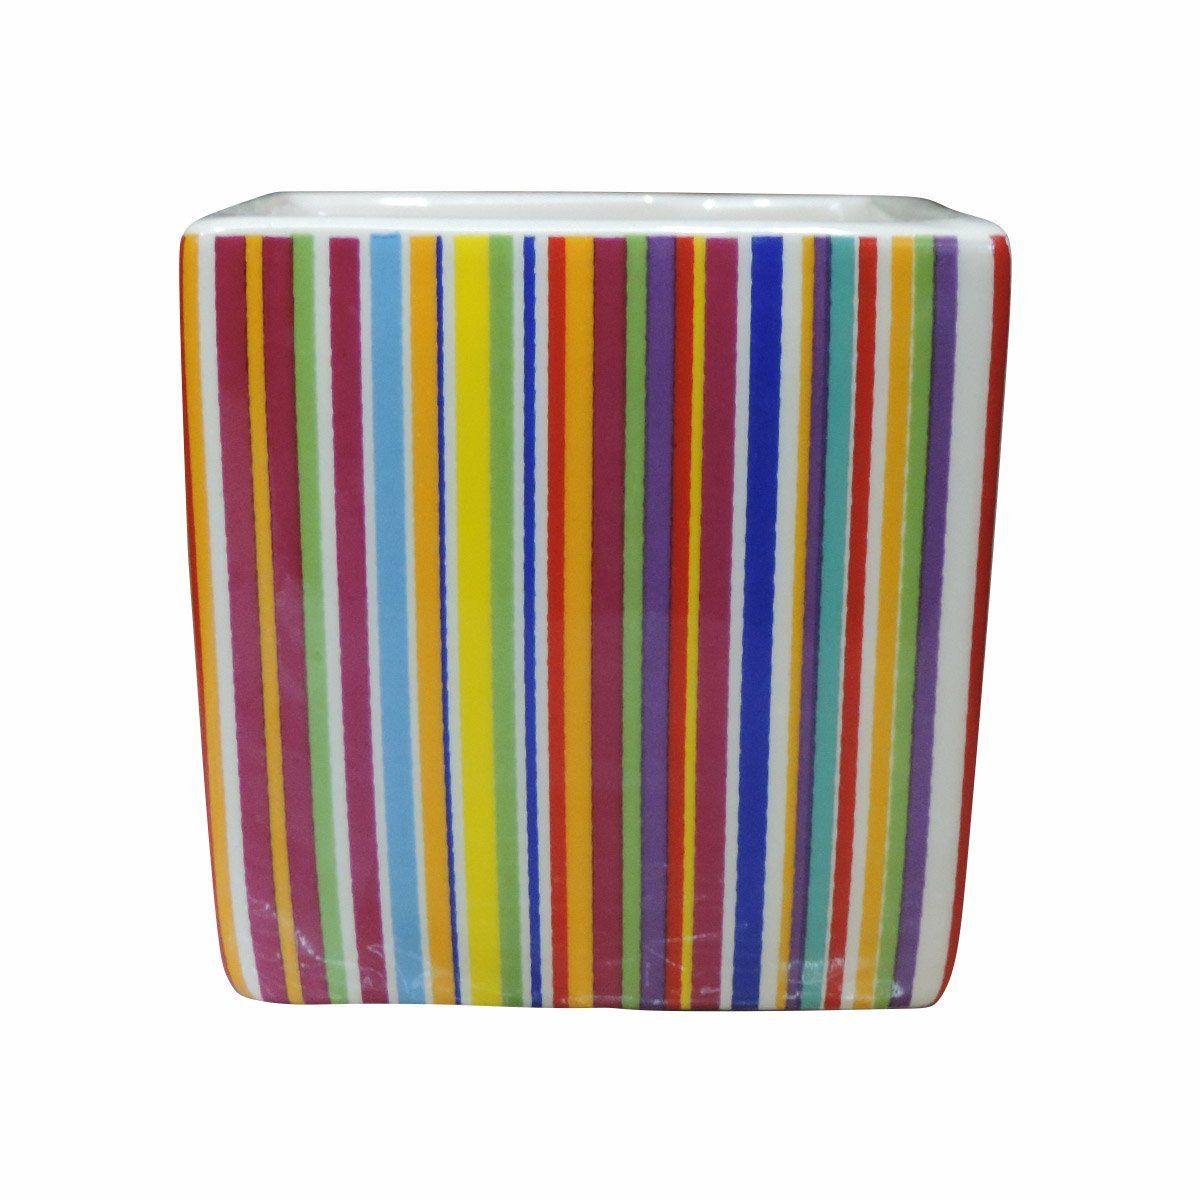 Vaso Magnético Cubo Art Deco 7cm x 7 cm